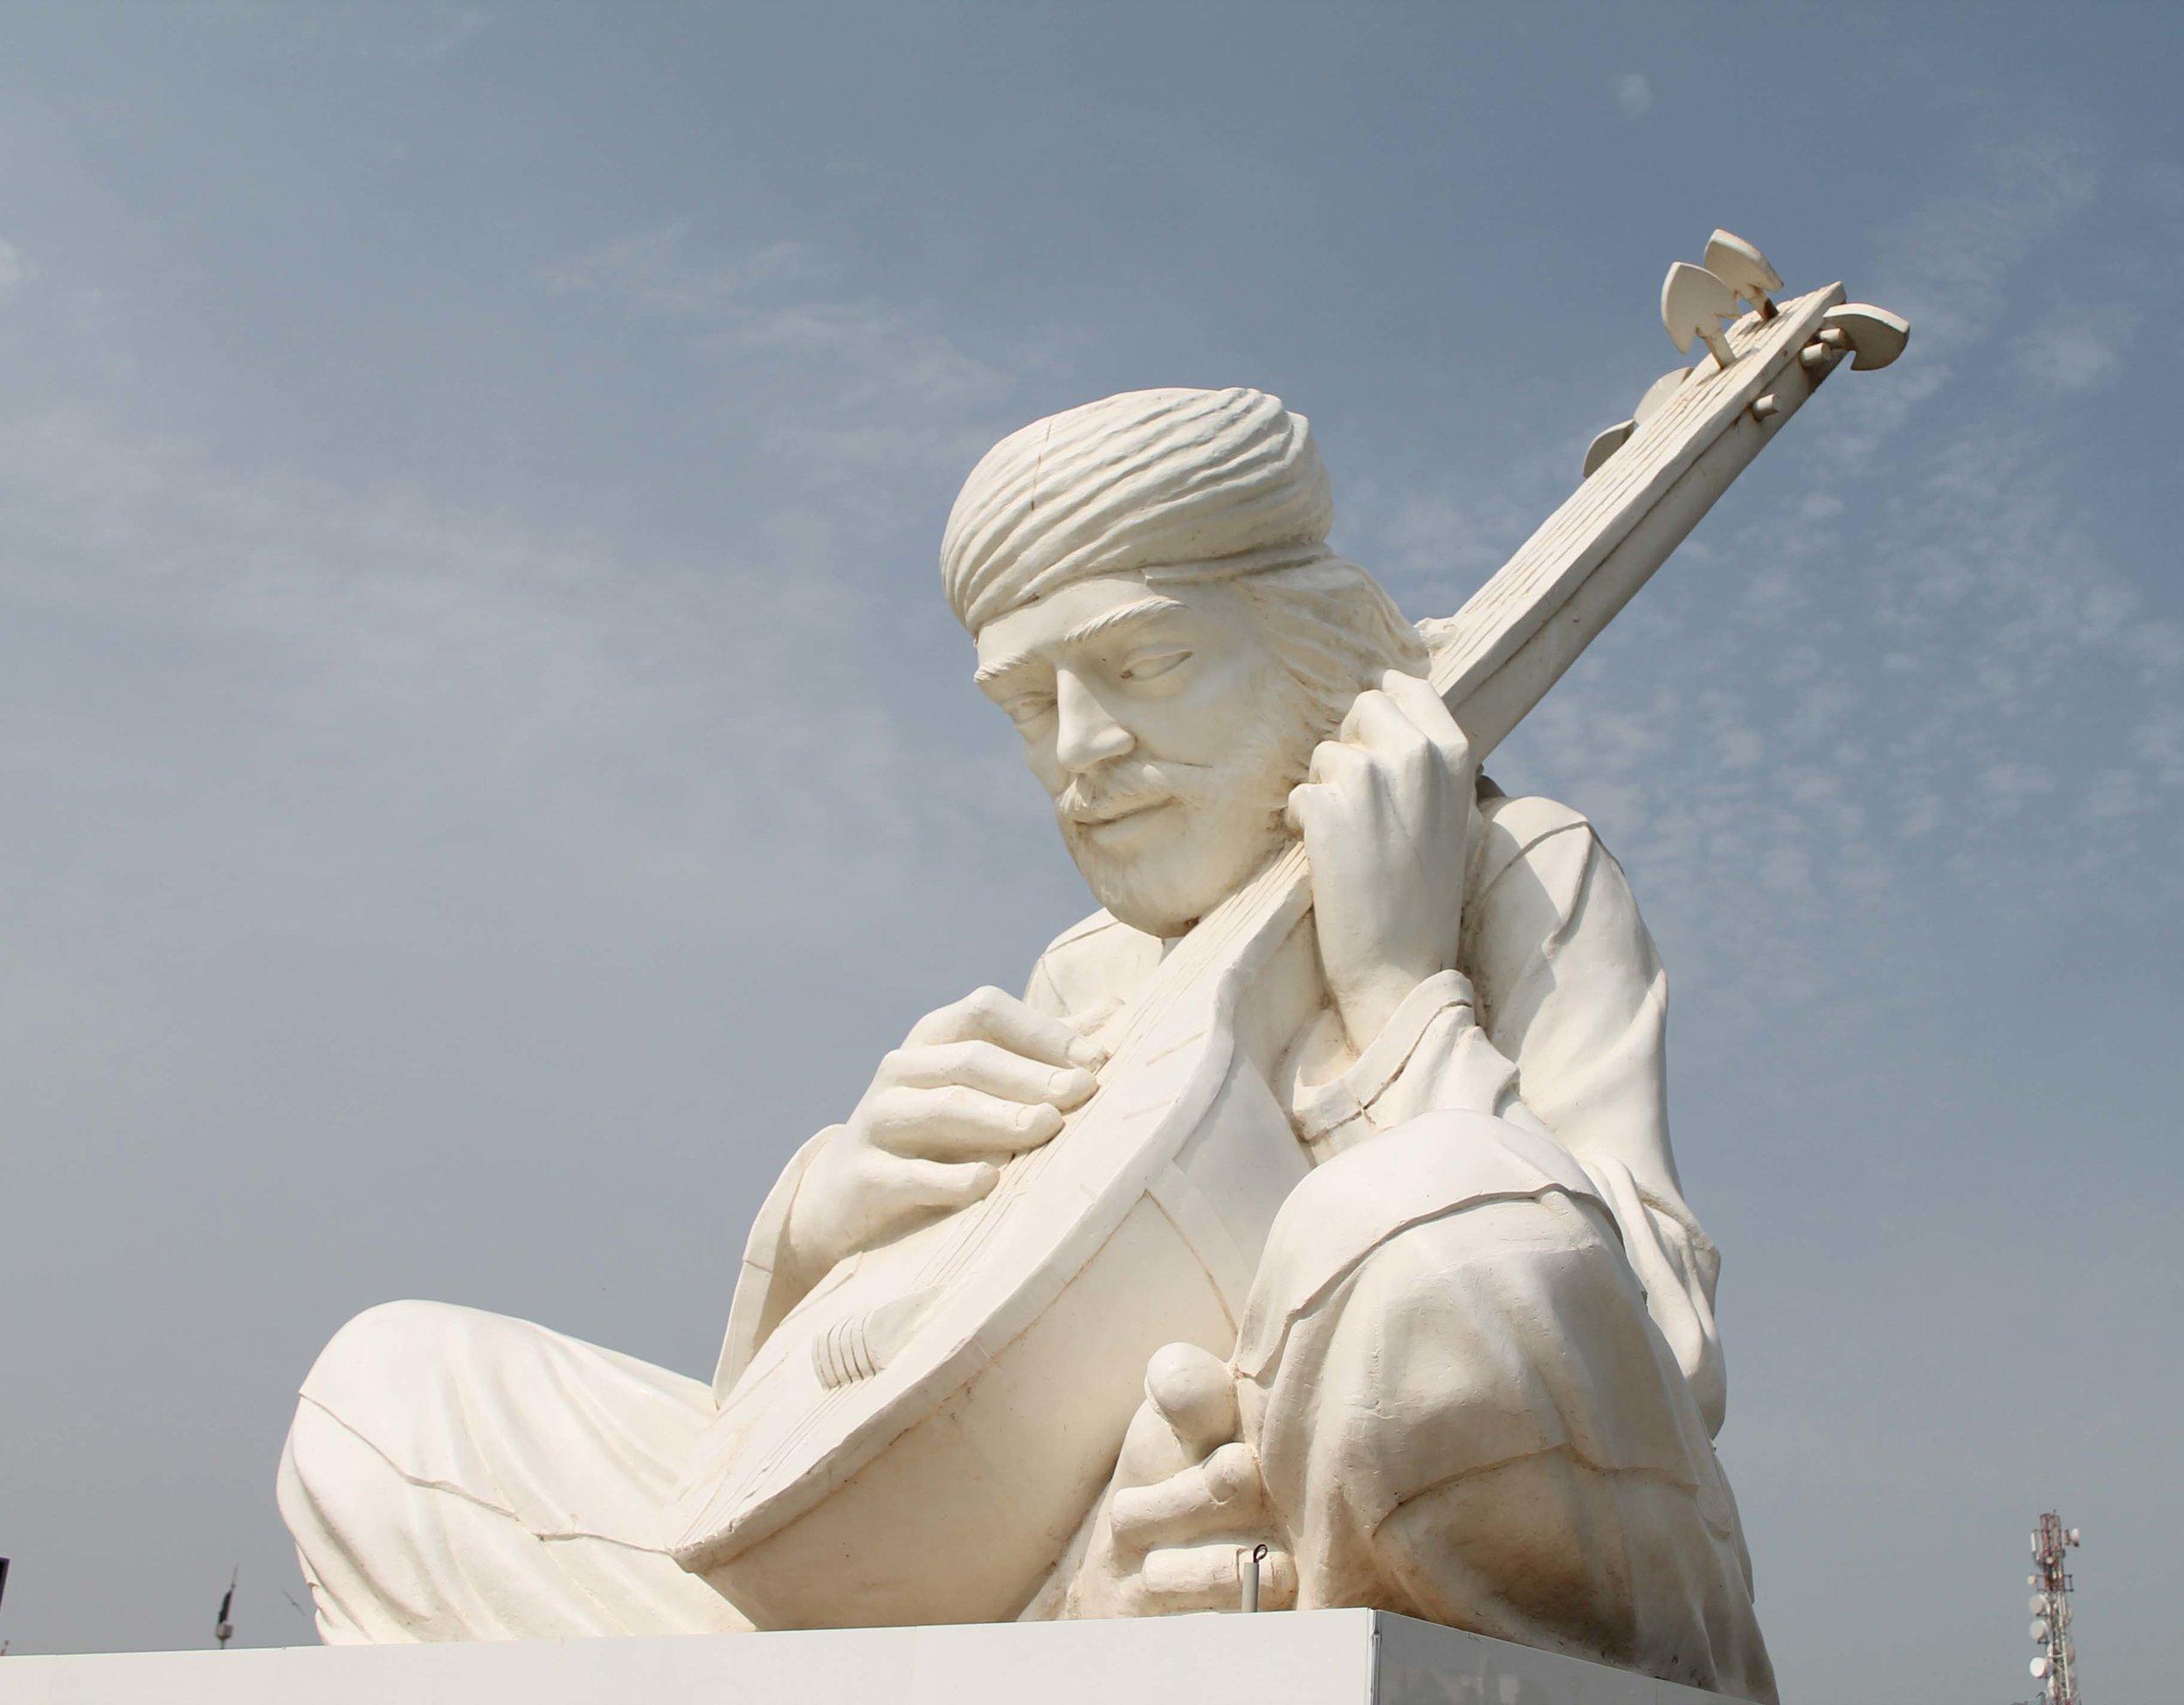 Statue of Shah Abdul Latif Bhittai by Nadir Ali Jamali in Bhit Shah